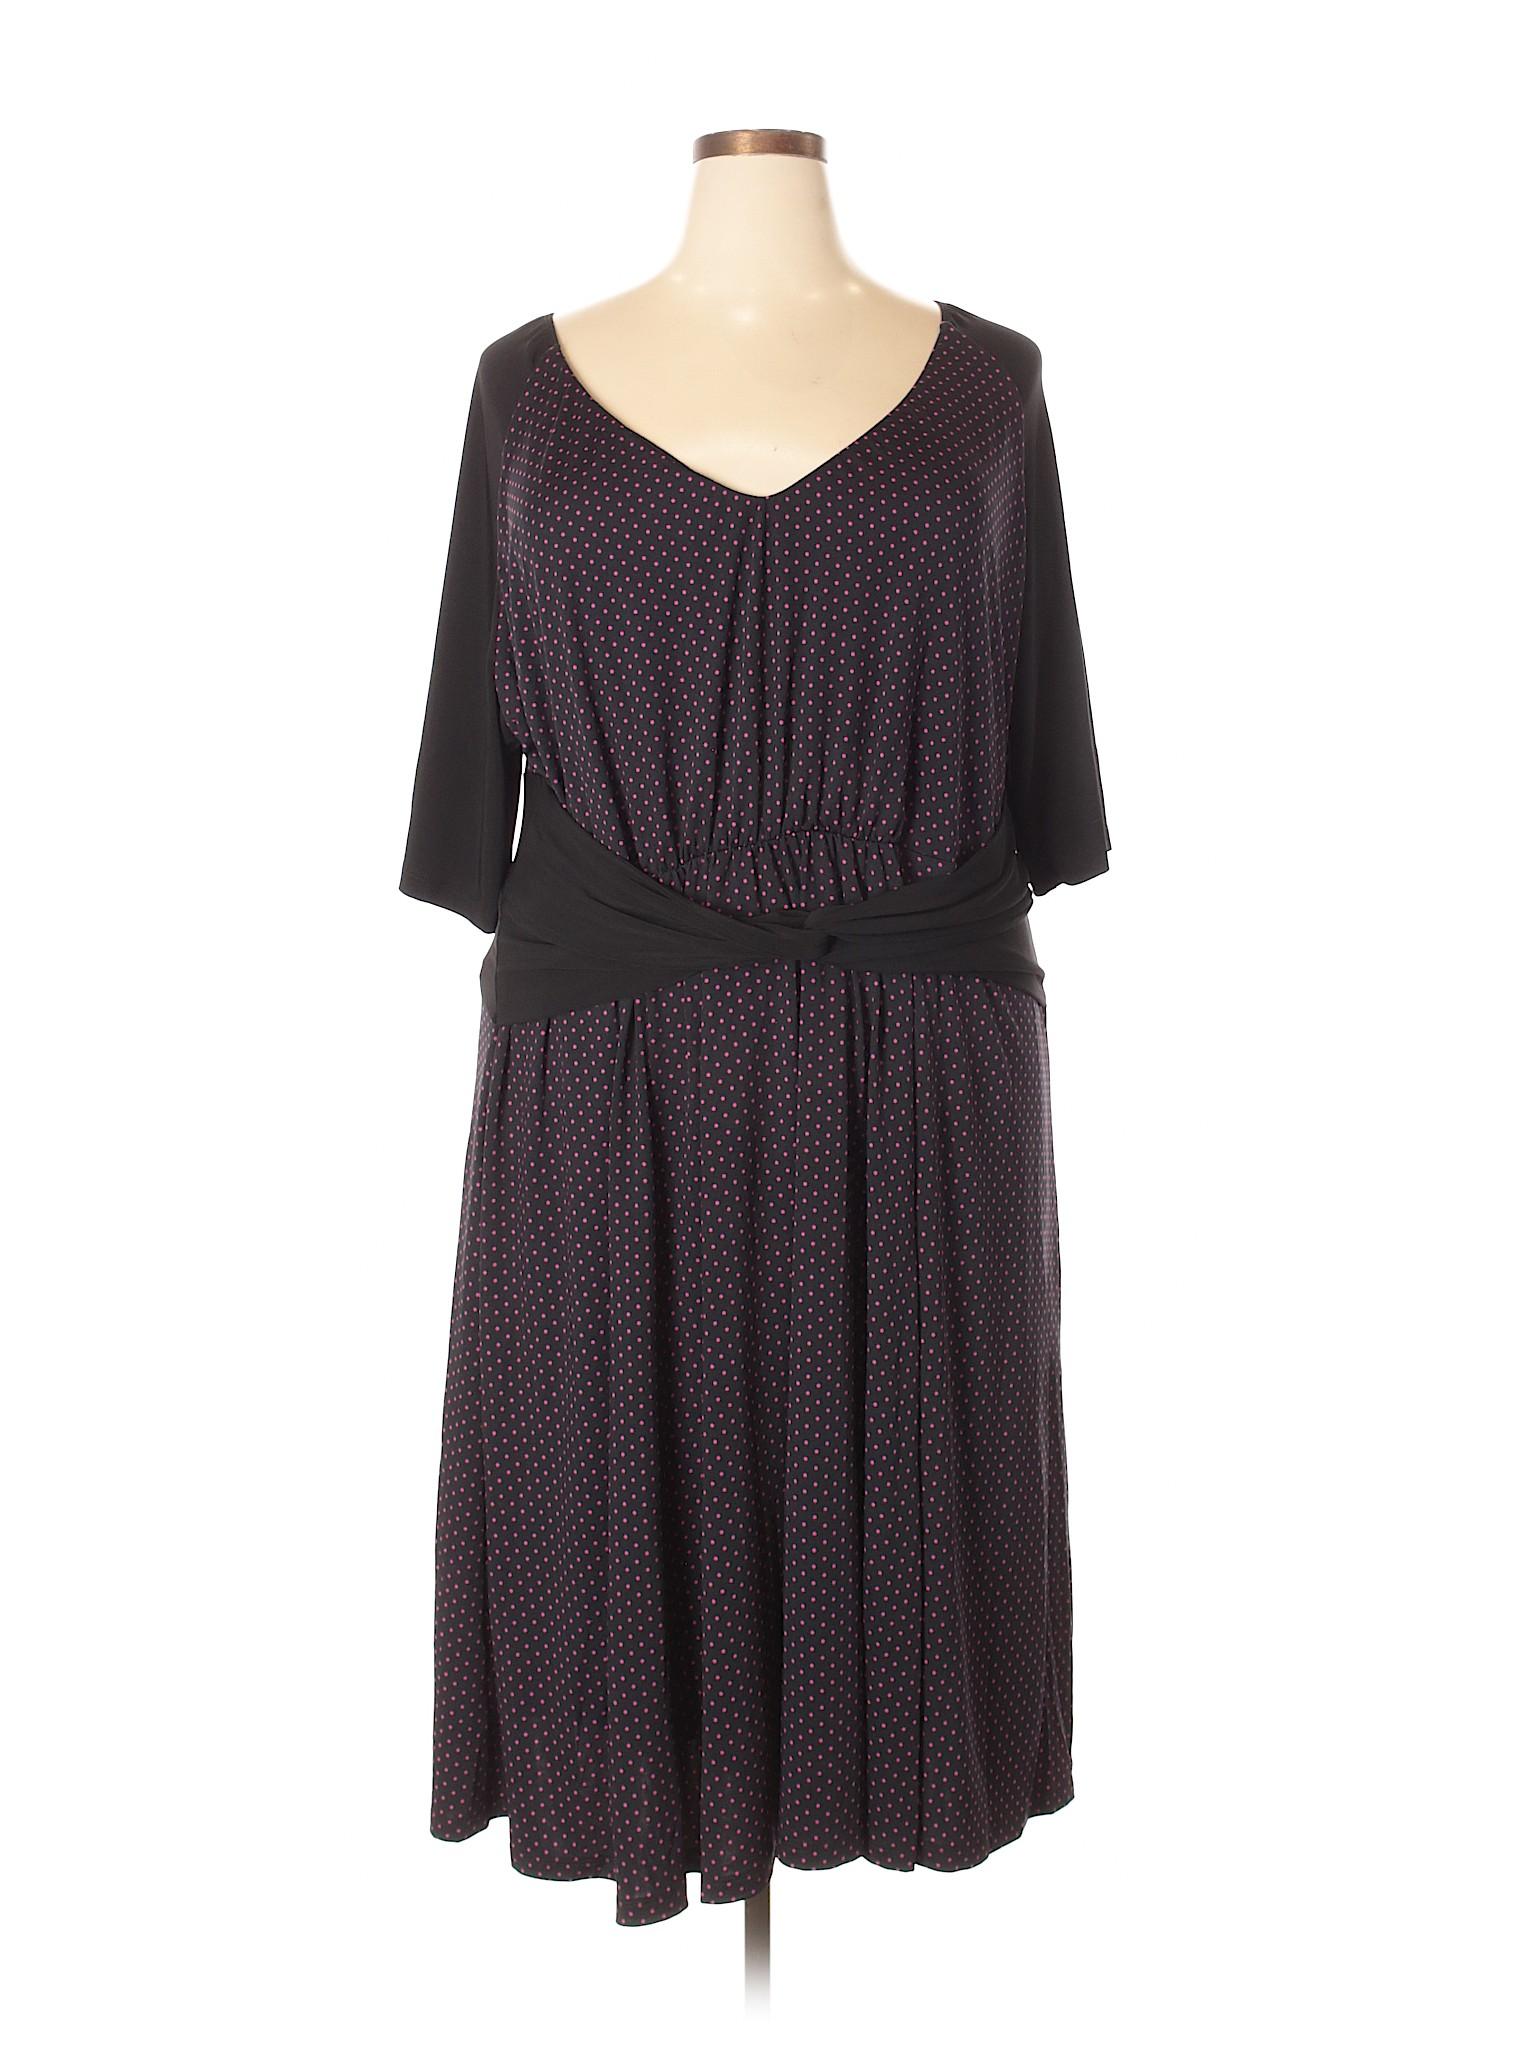 Selling IGIGI IGIGI Selling Casual Casual Dress Dress 7xxIqFd